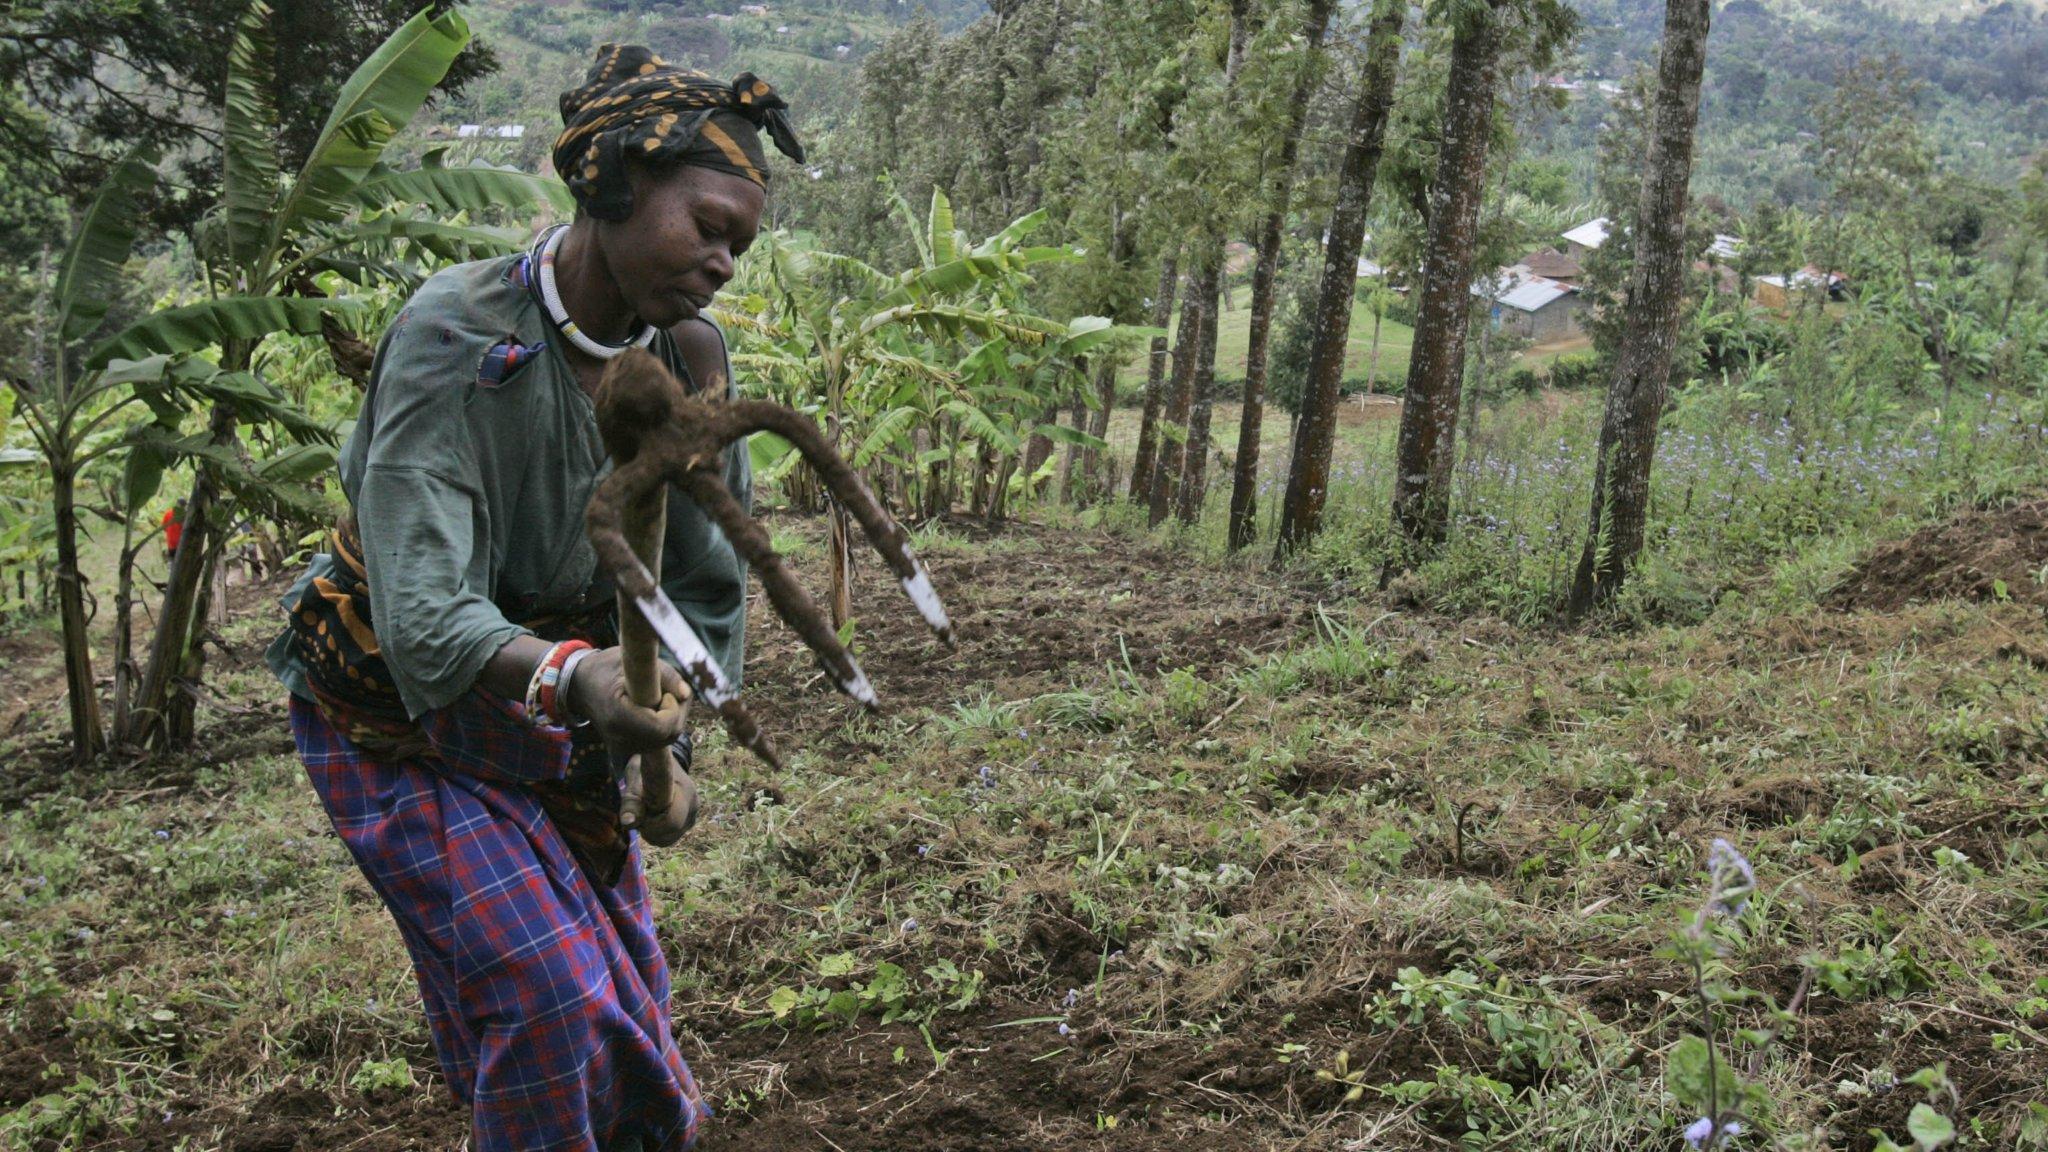 Create jobs or face chaos is the choice awaiting Africa